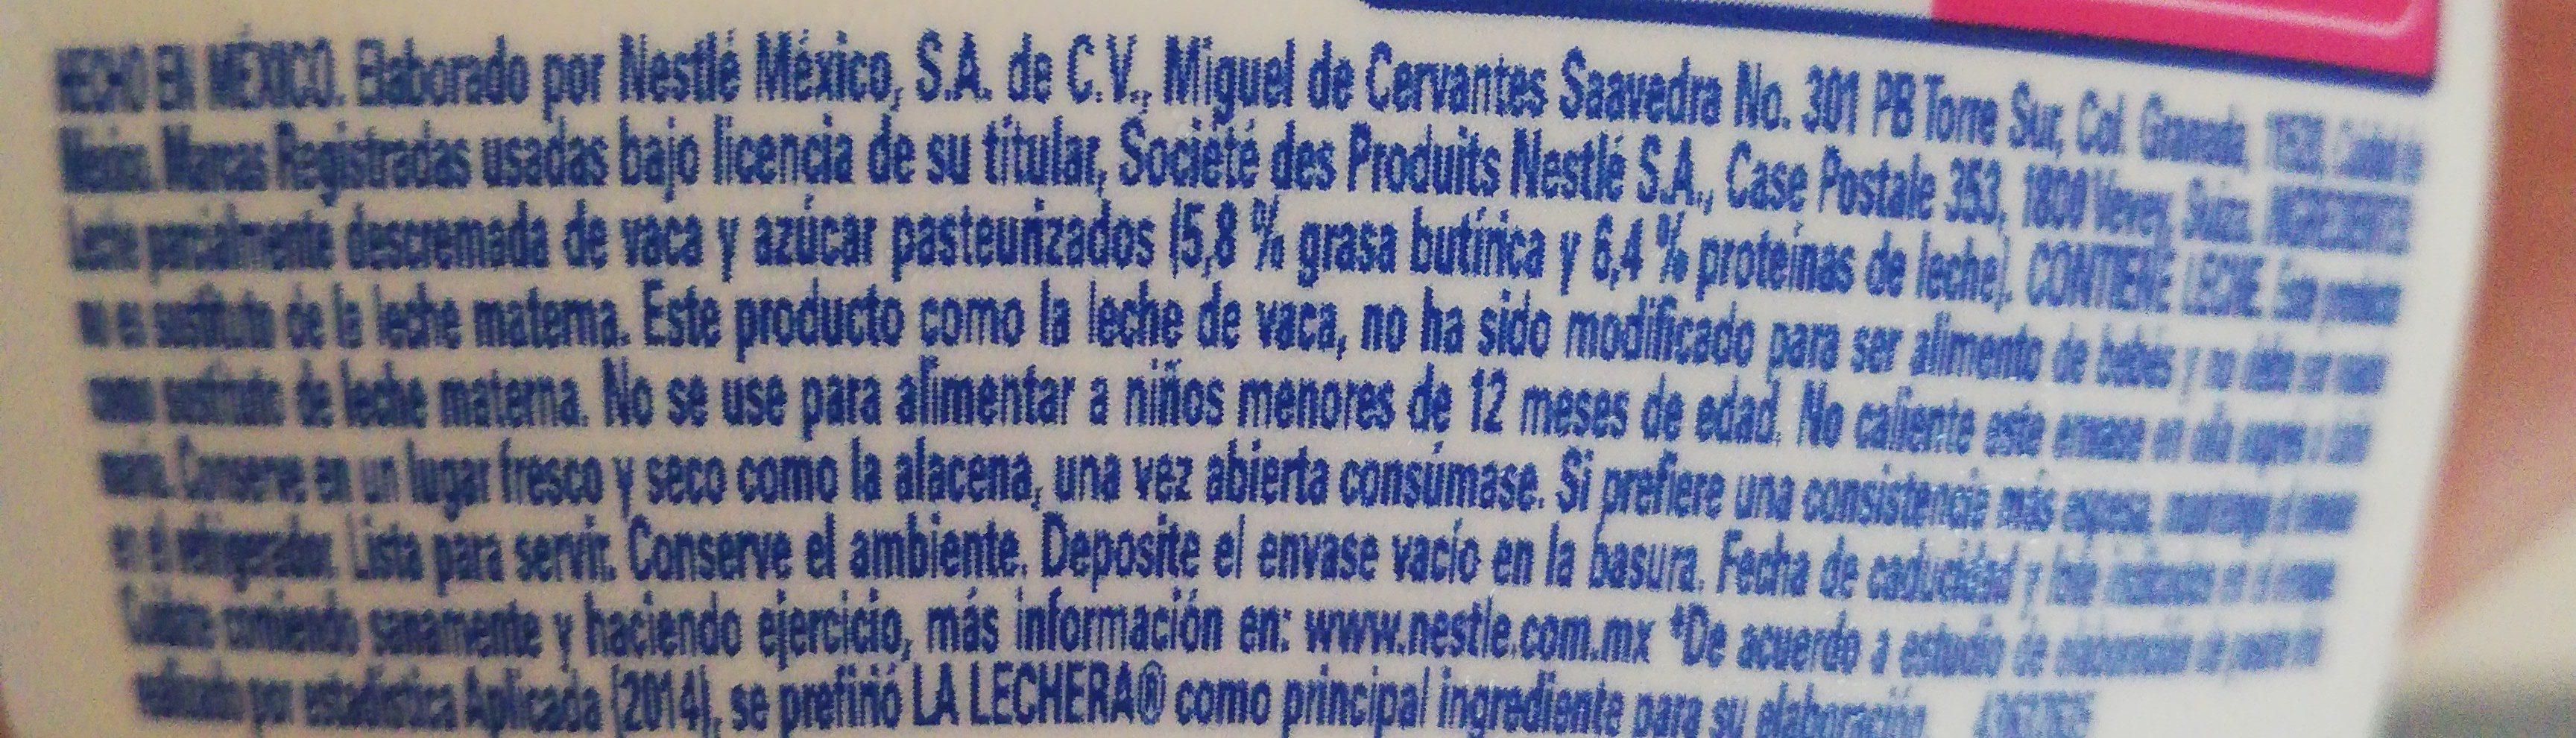 La Lechera Botella Squeeze 335 GRS - Ingredients - en